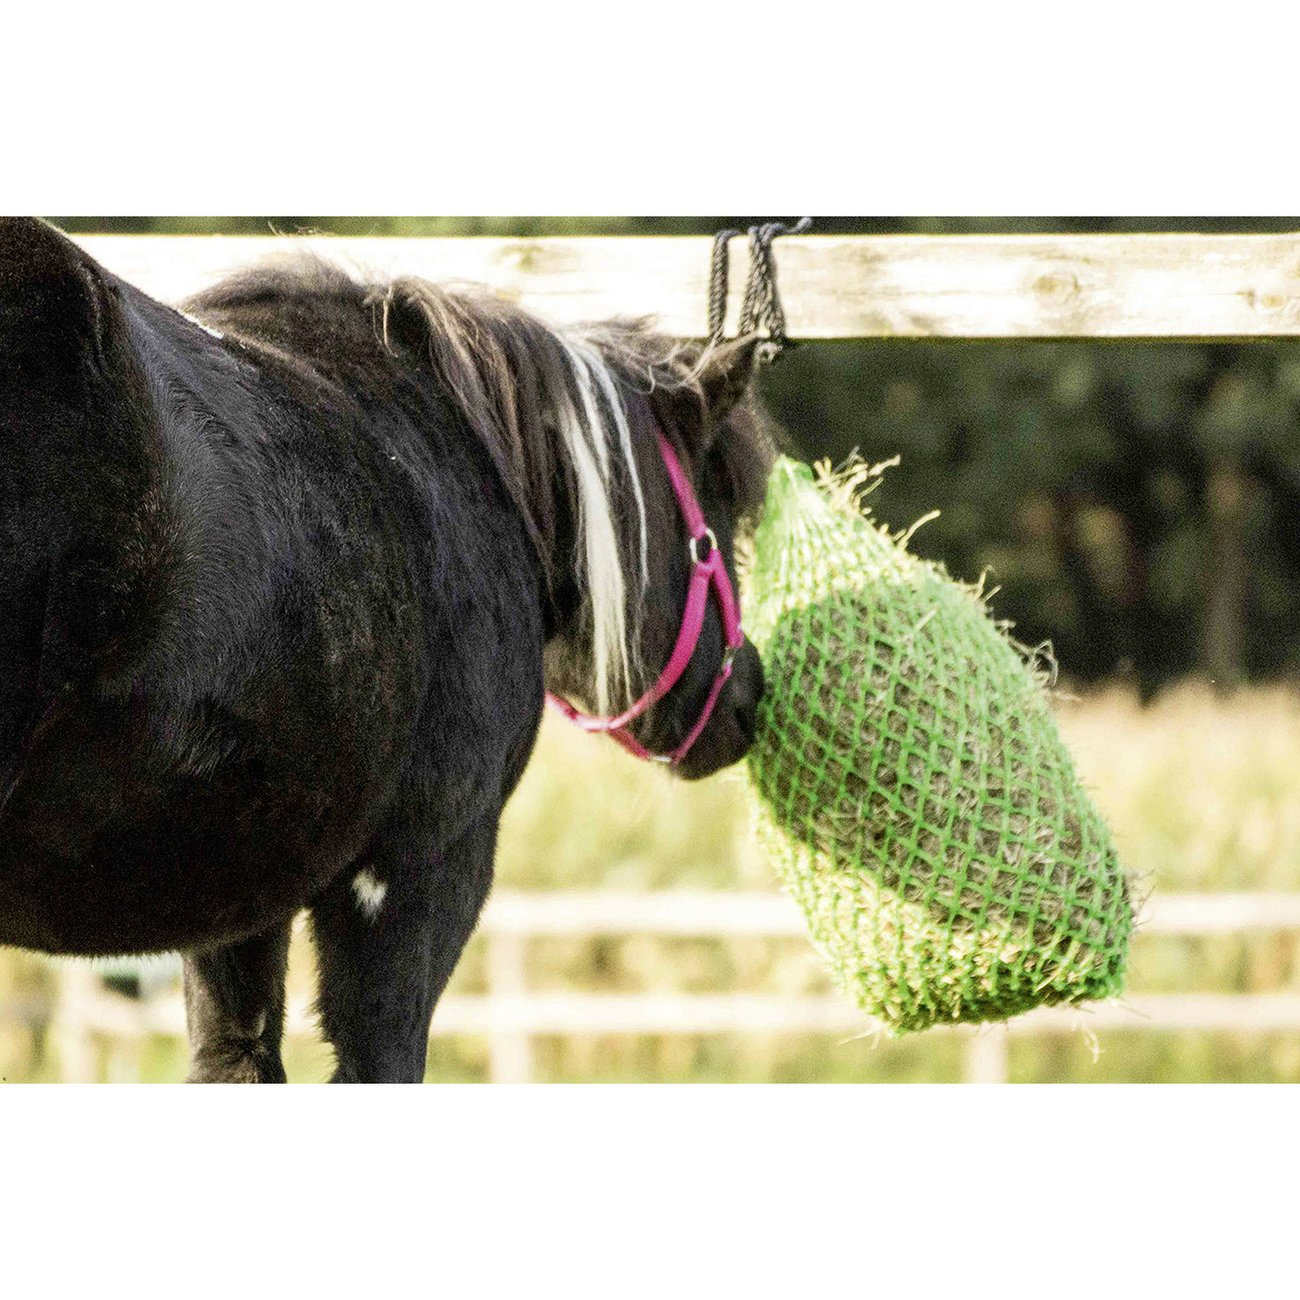 BUSSE Pony Heunetz Little, Bild 2